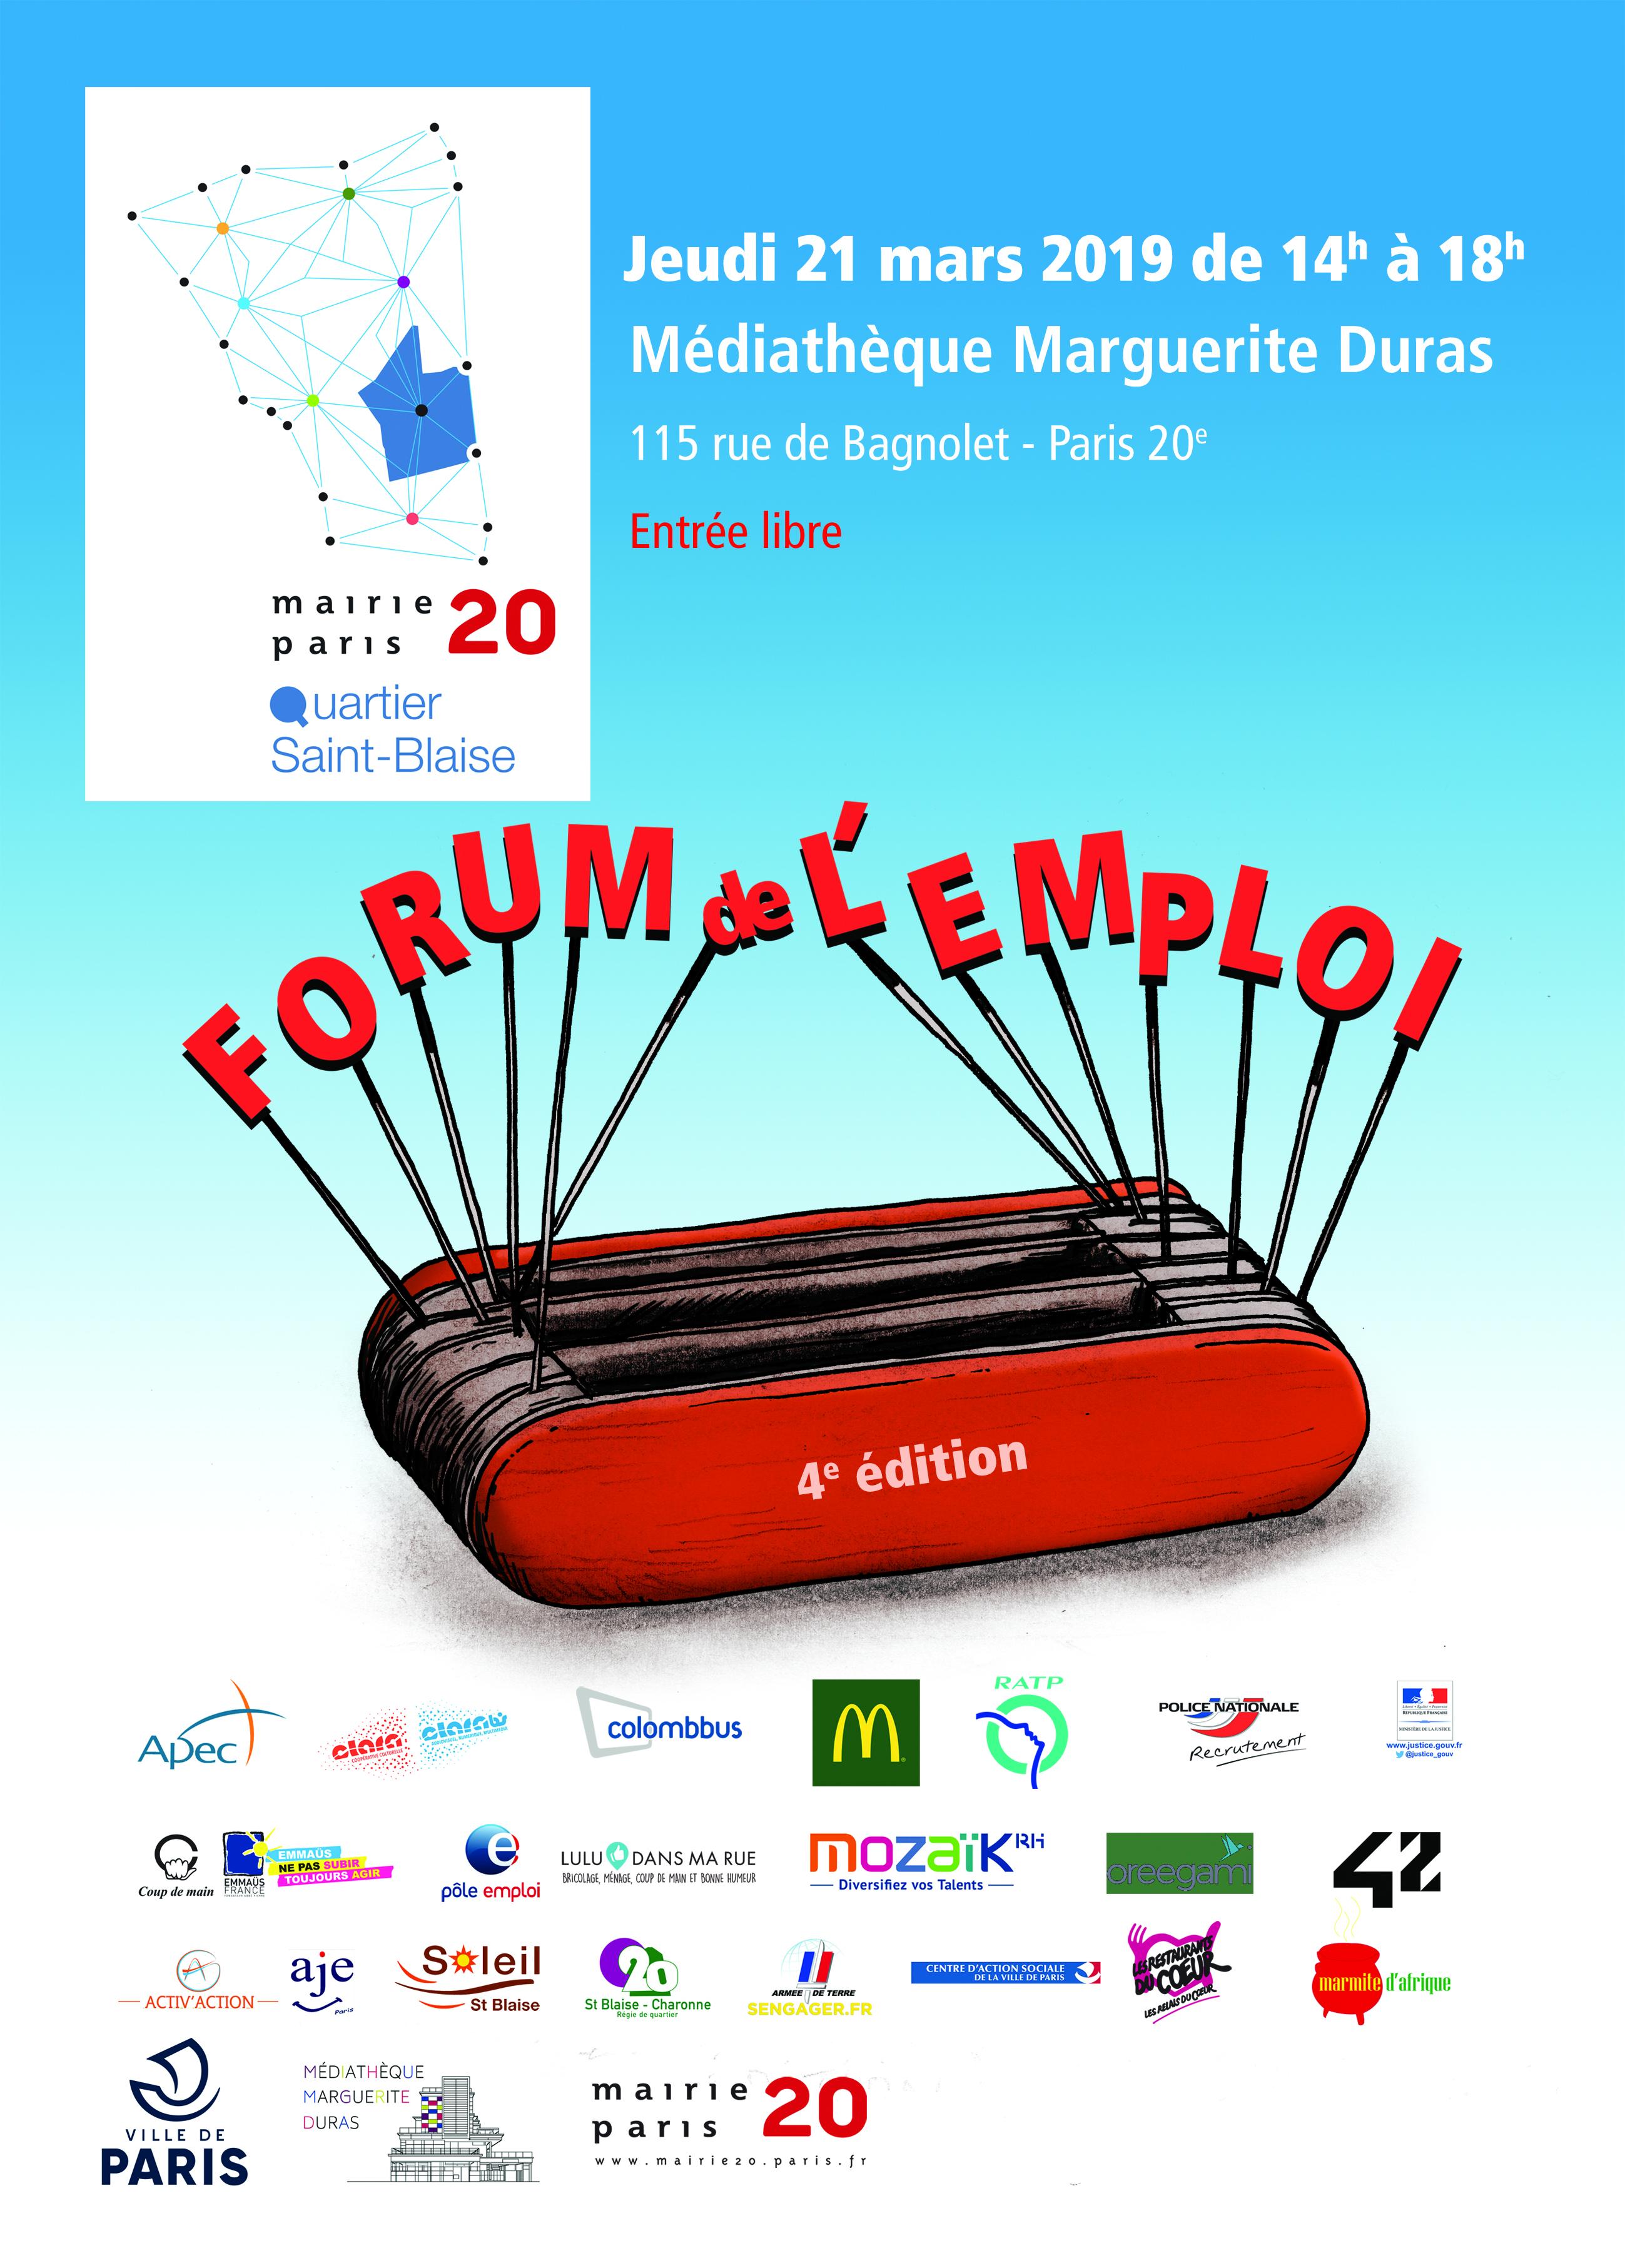 Forum emploi 4e édition